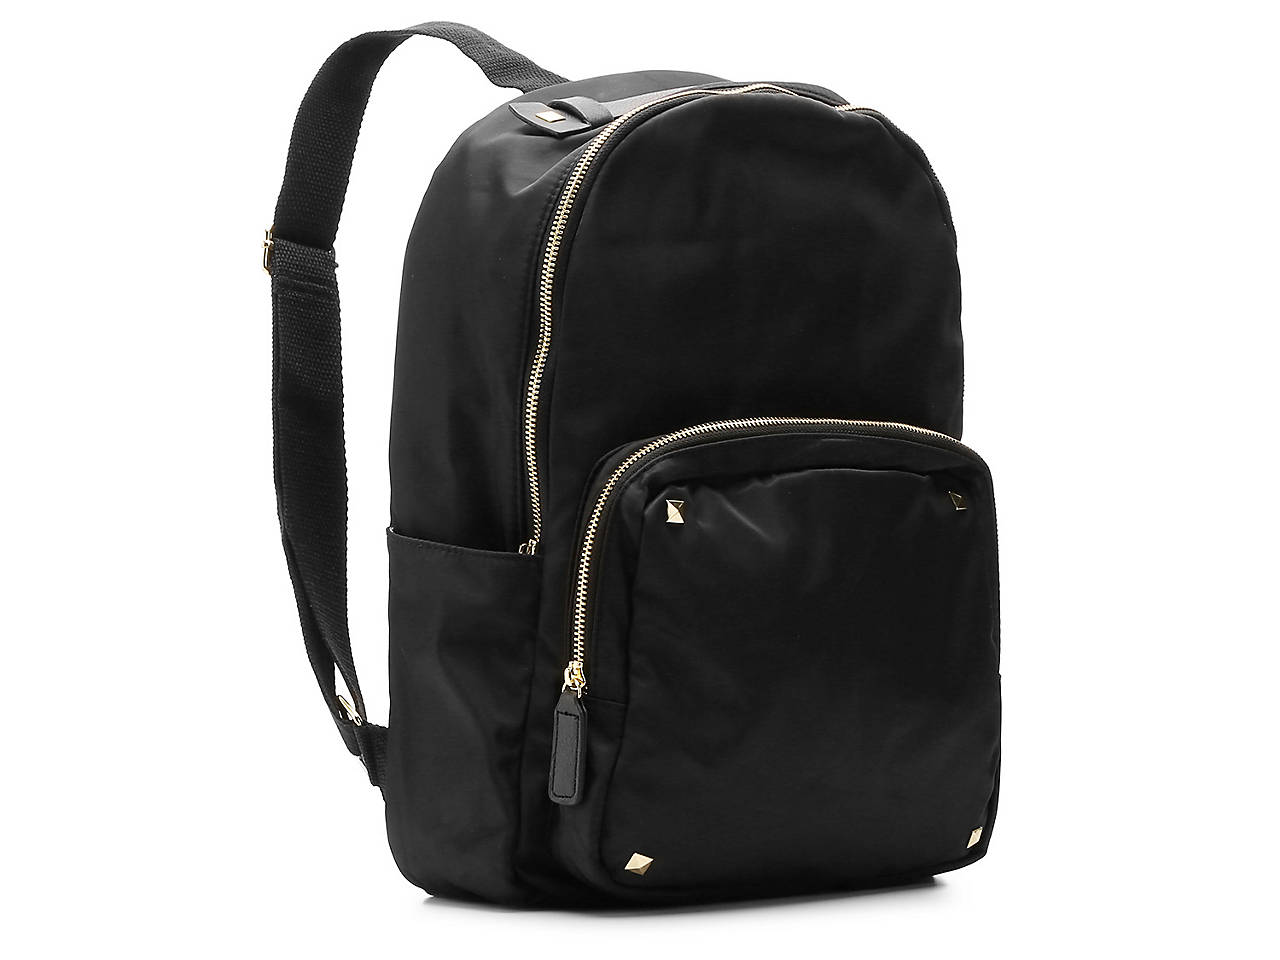 Madden Girl Wright Backpack Women's Handbags & Accessories | DSW